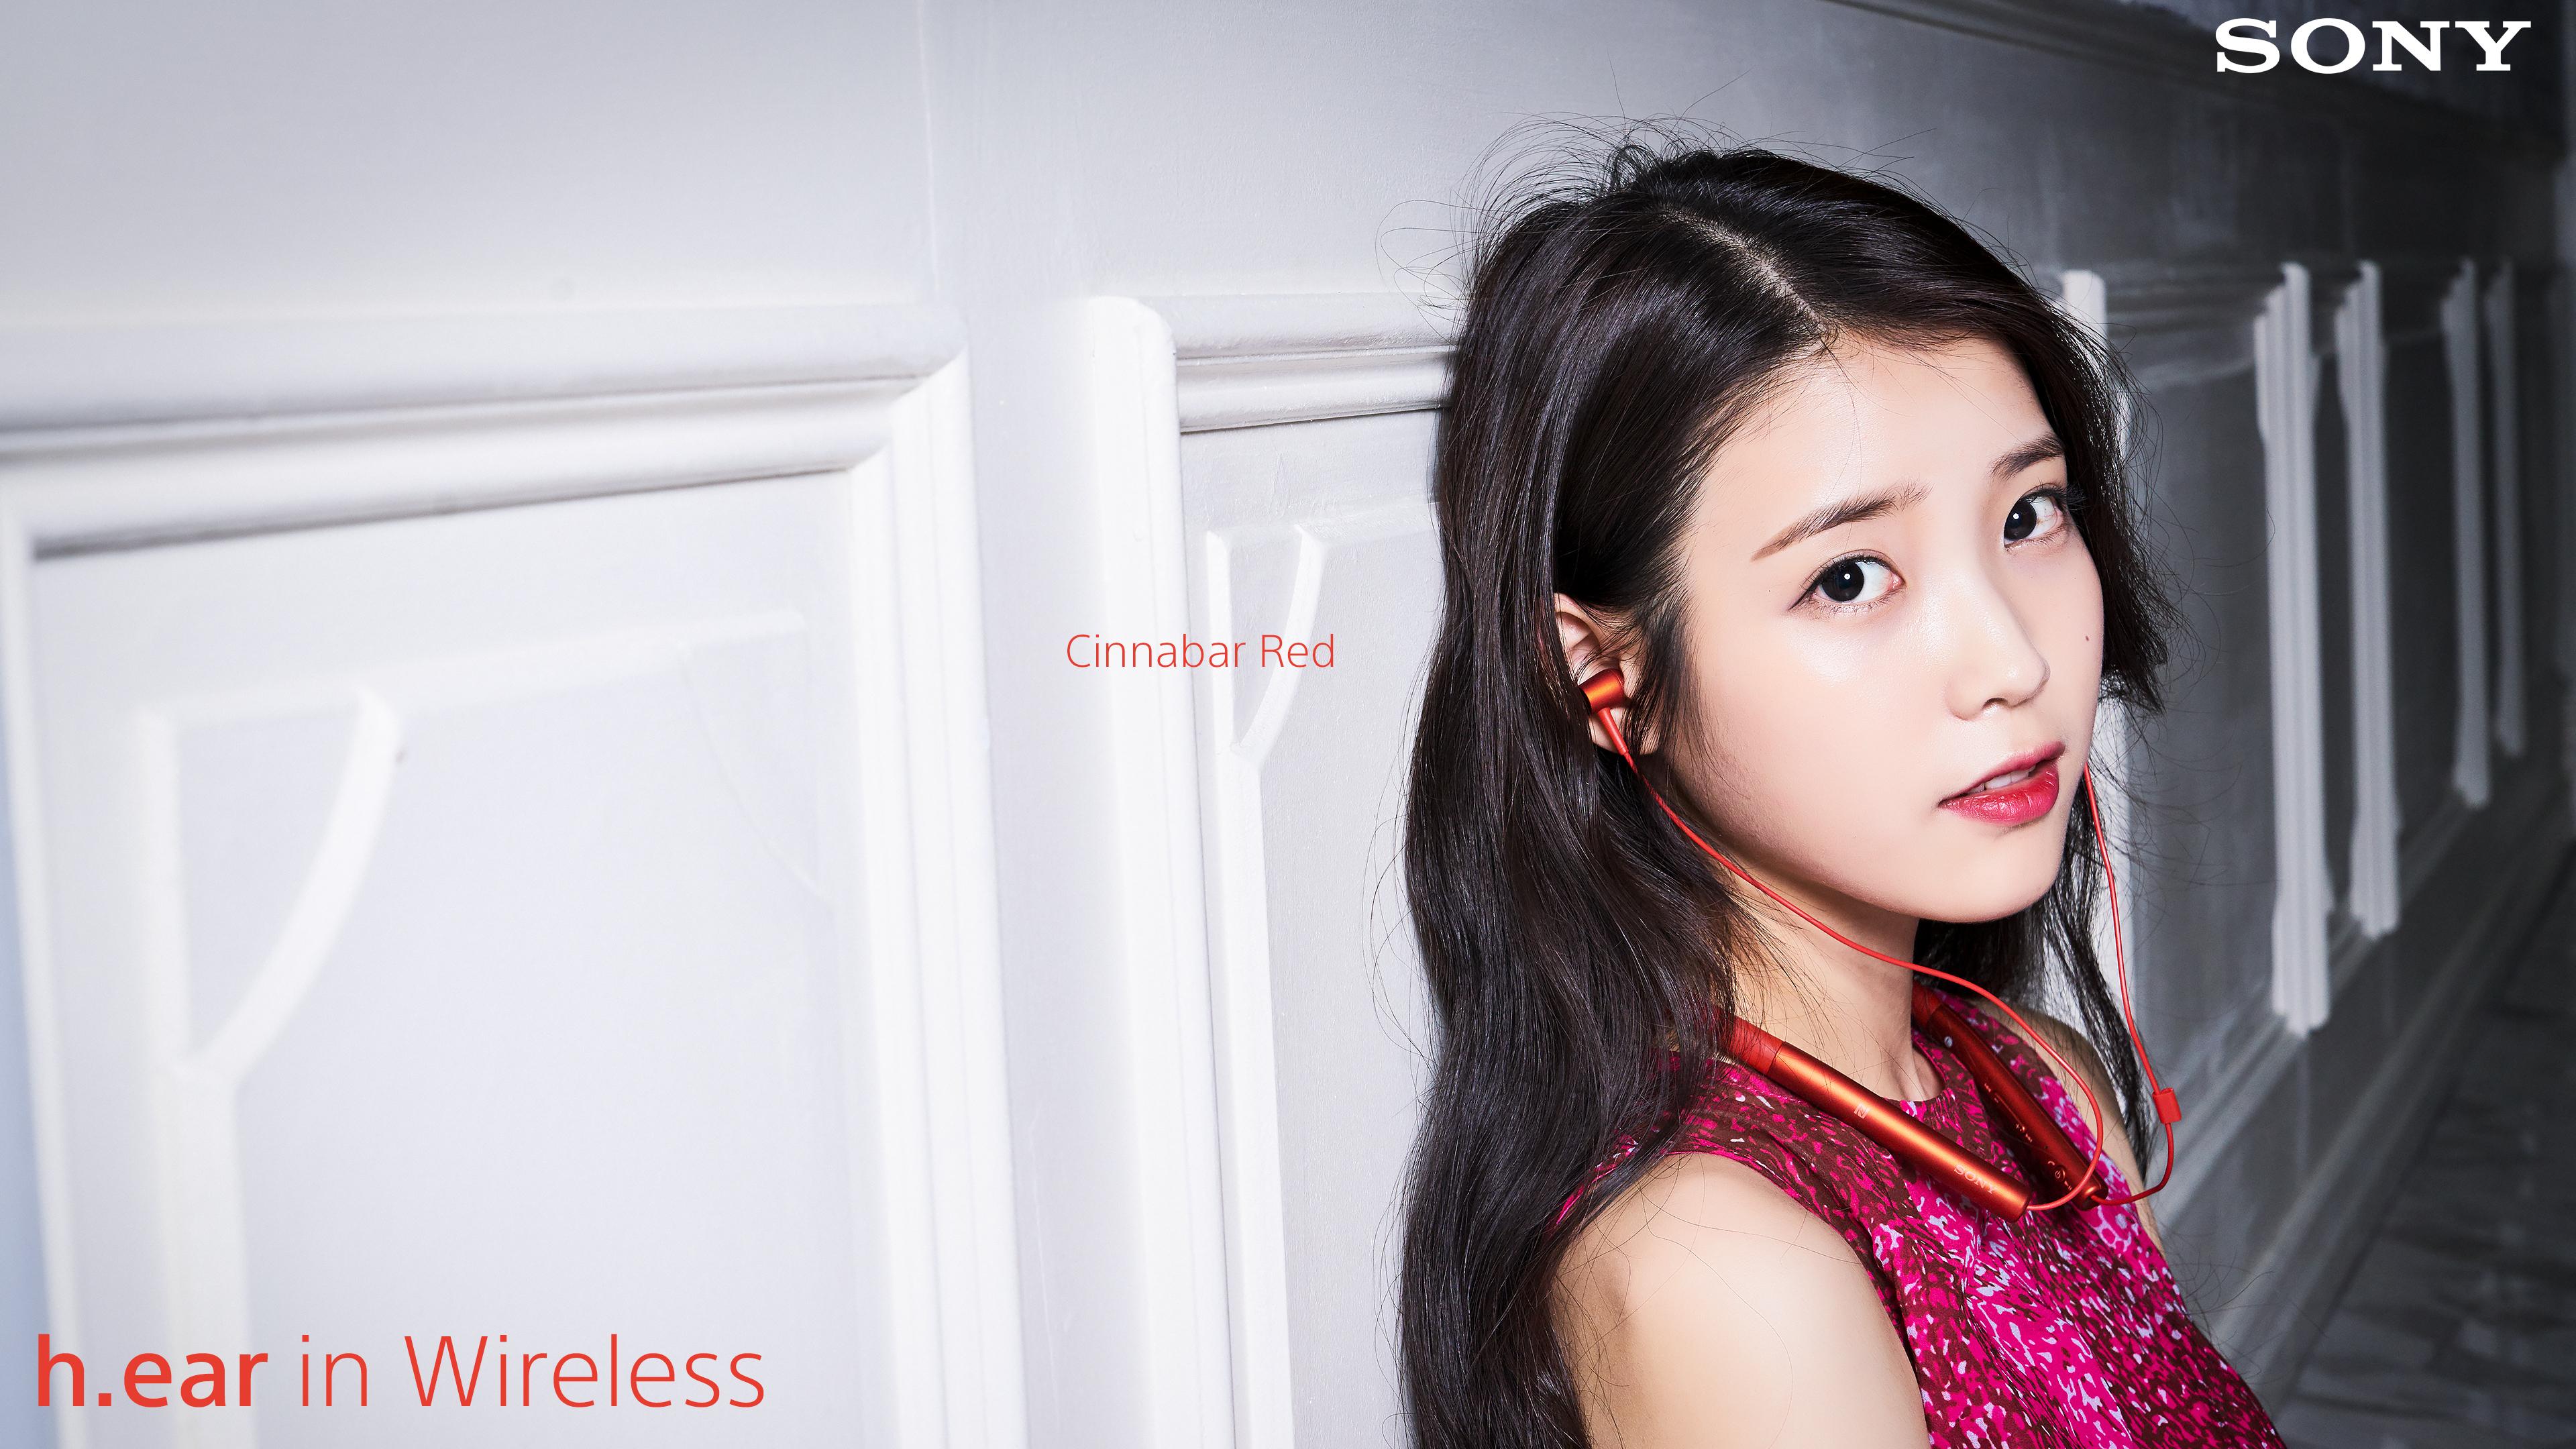 Iu Hd Wallpaper 47553 Asiachan Kpop Image Board